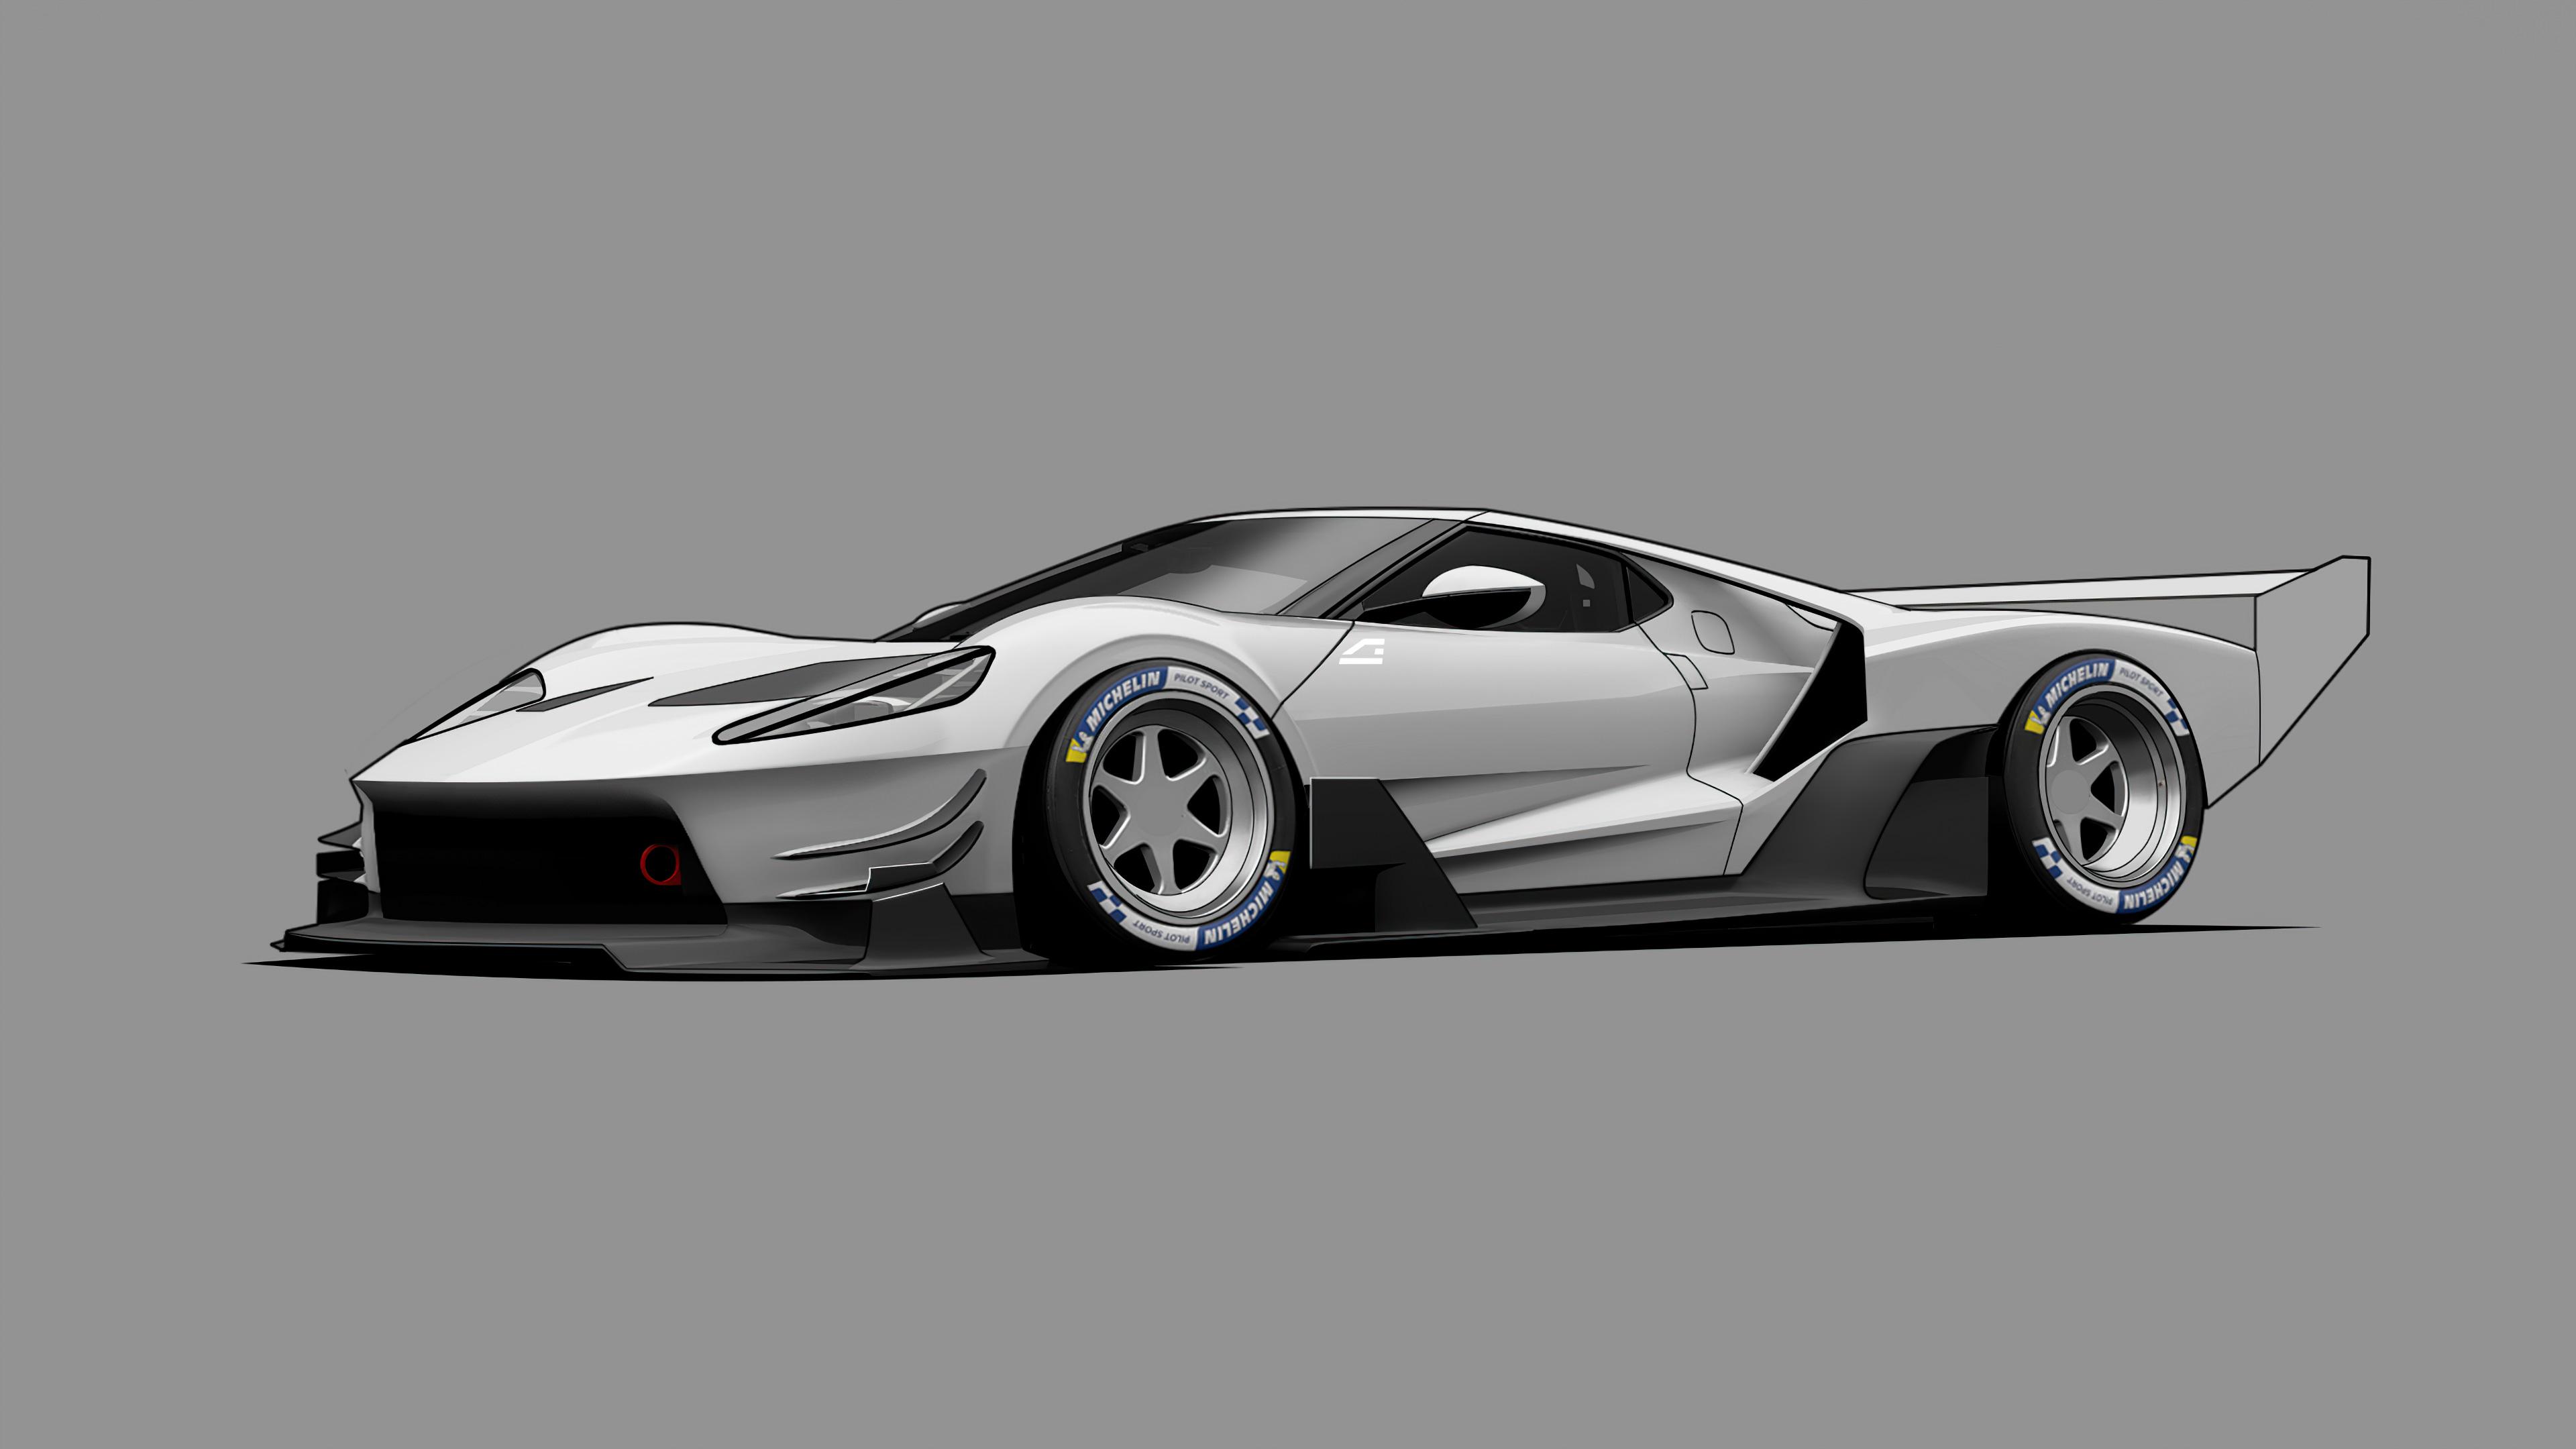 ford gt c vgt minimal grey 4k 1608907628 - Ford GT C Vgt Minimal Grey 4k - Ford GT C Vgt Minimal Grey 4k wallpapers